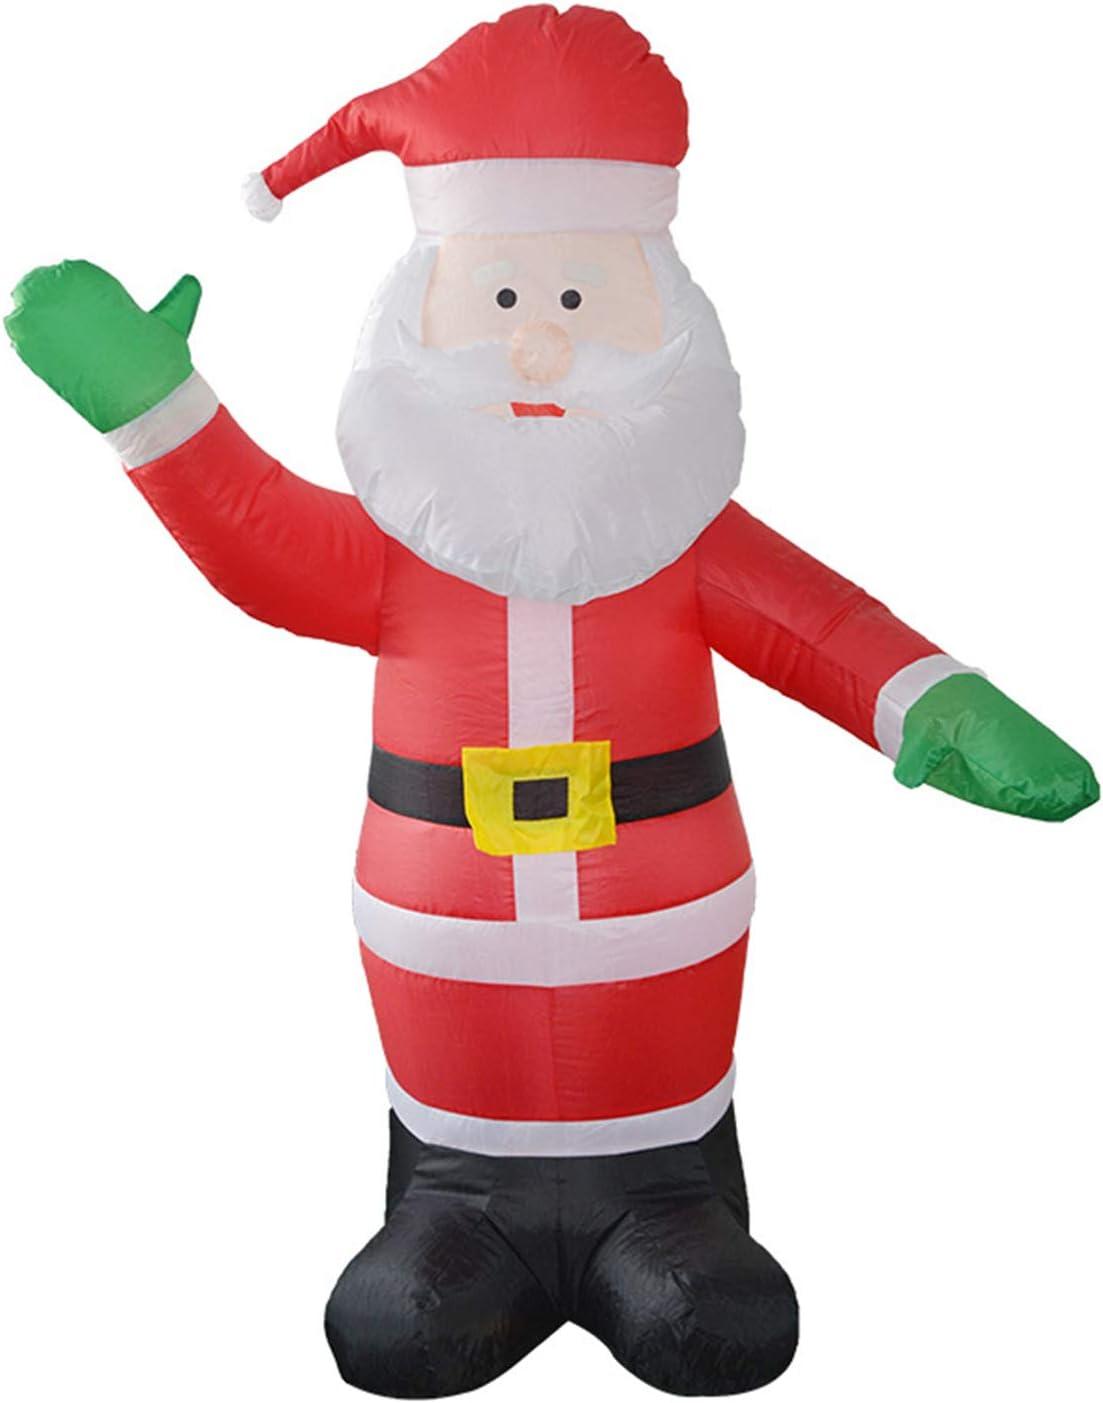 LOVEPET Santa Claus Modelo Inflable Navidad Grandes Apoyos ...